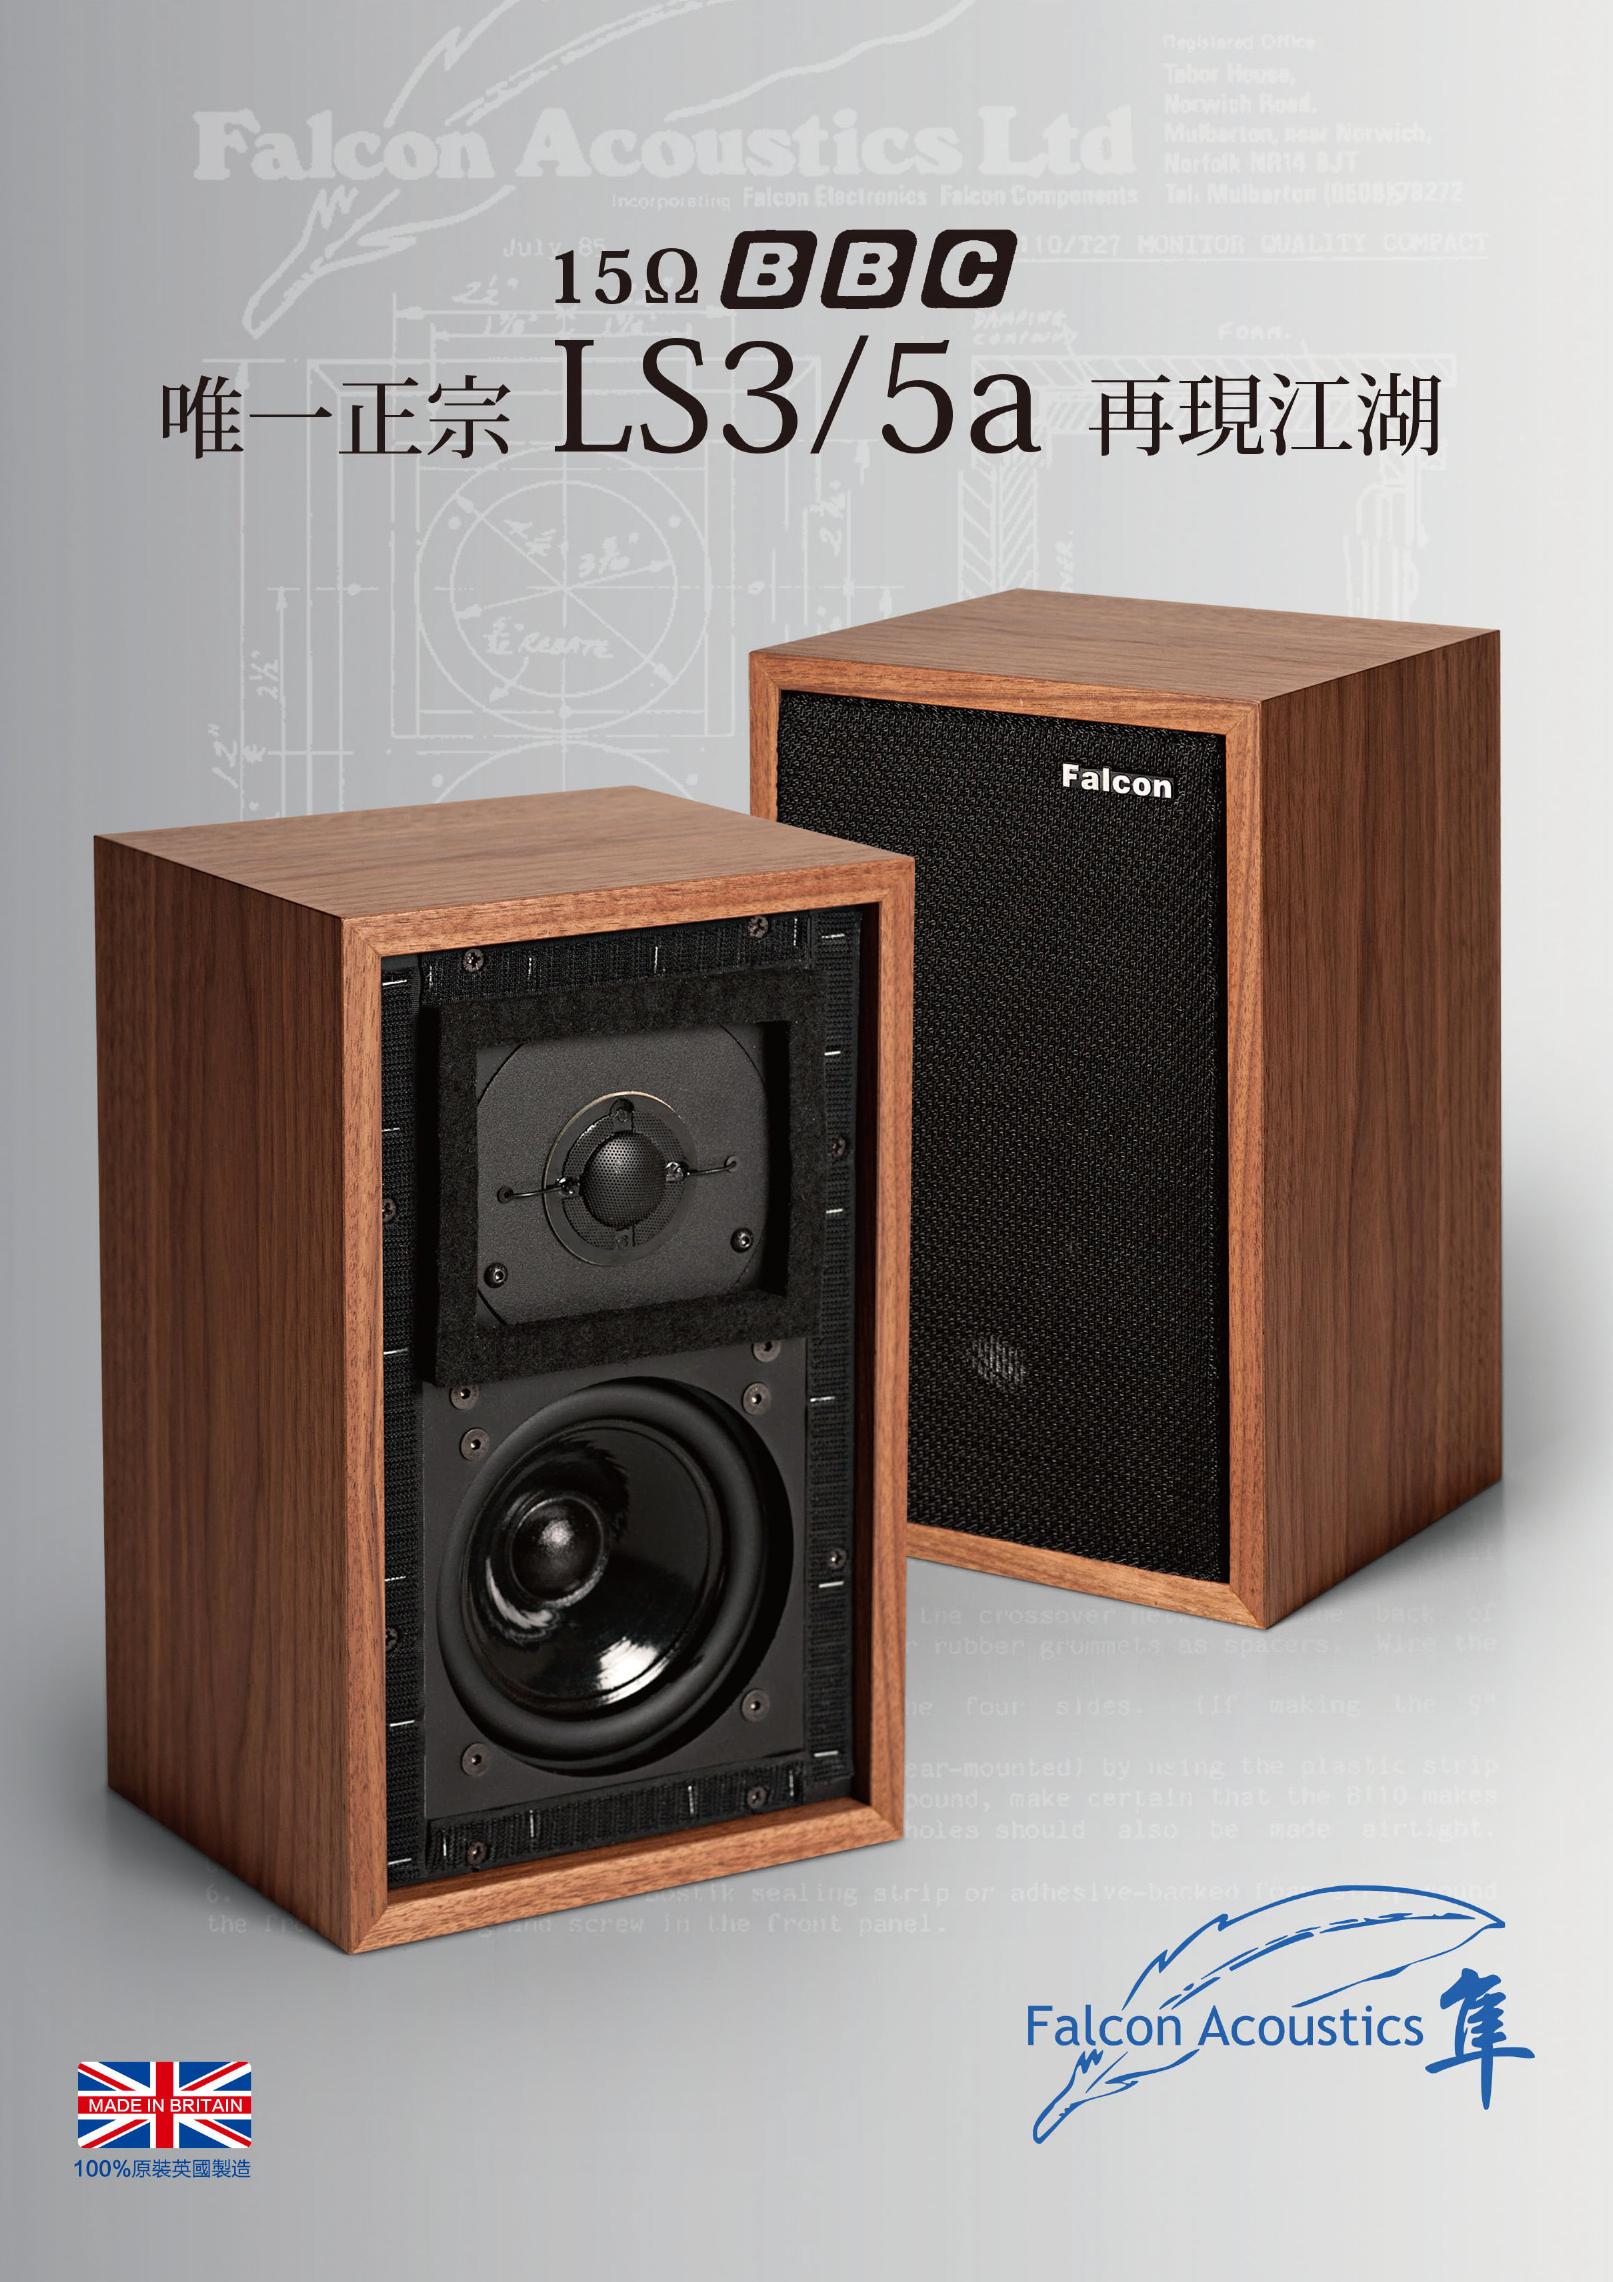 Falcon Acoustics_201803_05a-1